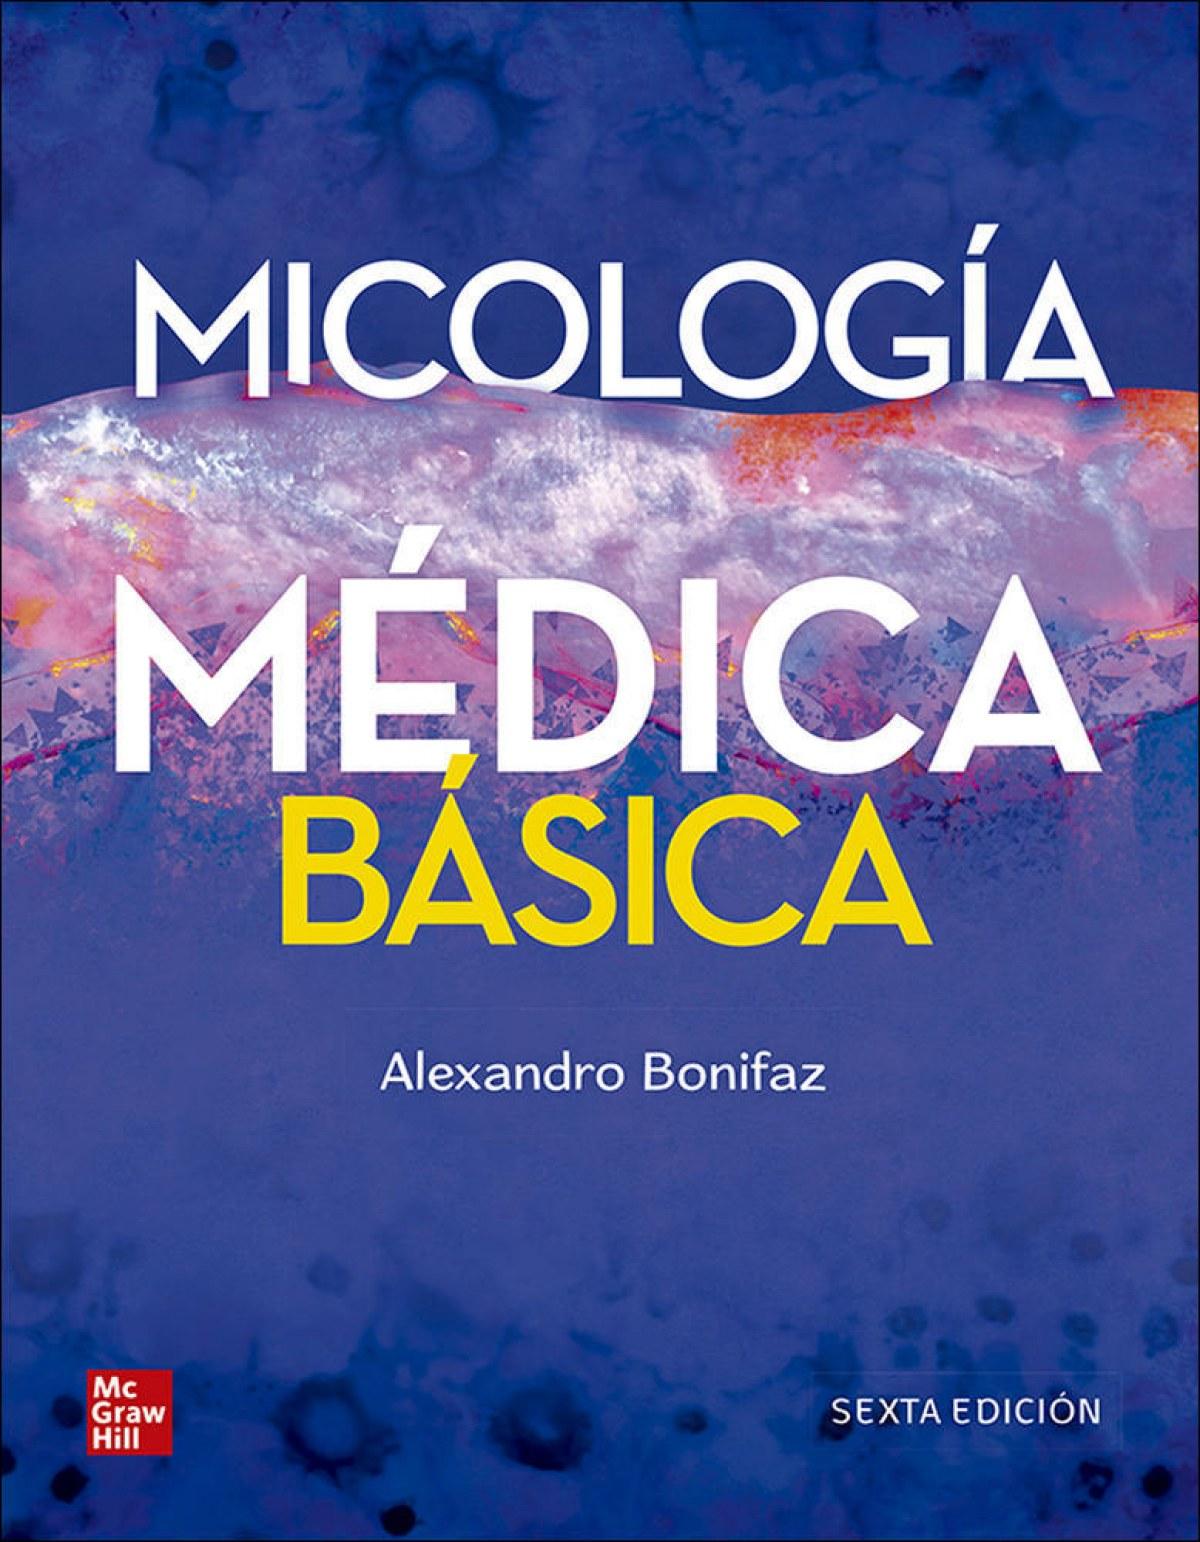 MICOLOGIA MEDICA BASICA